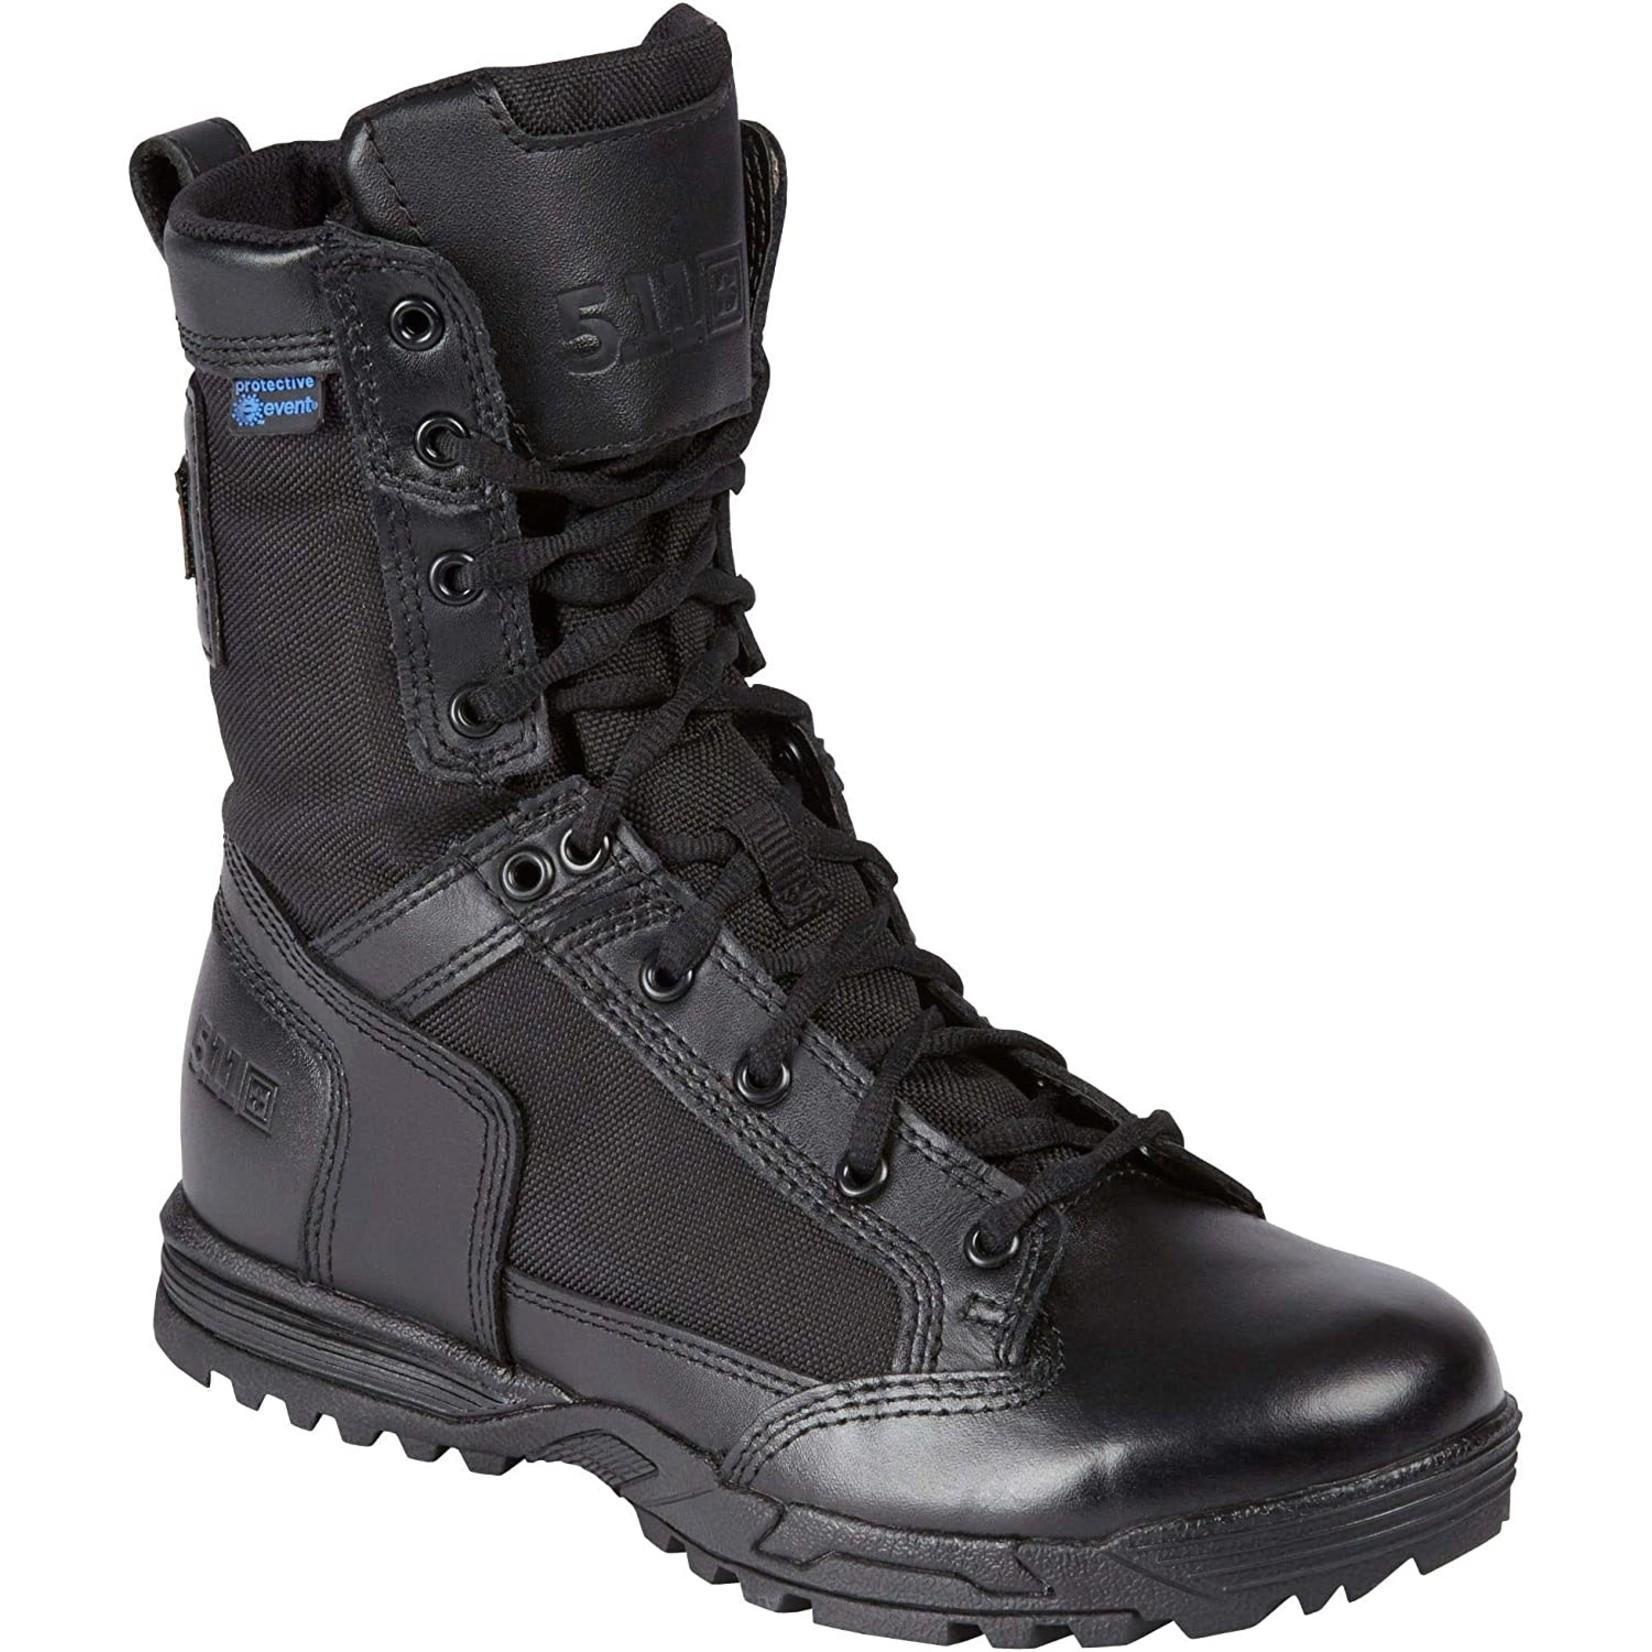 5.11 Tactical 5.11 Skyweight Patrol WP Boot